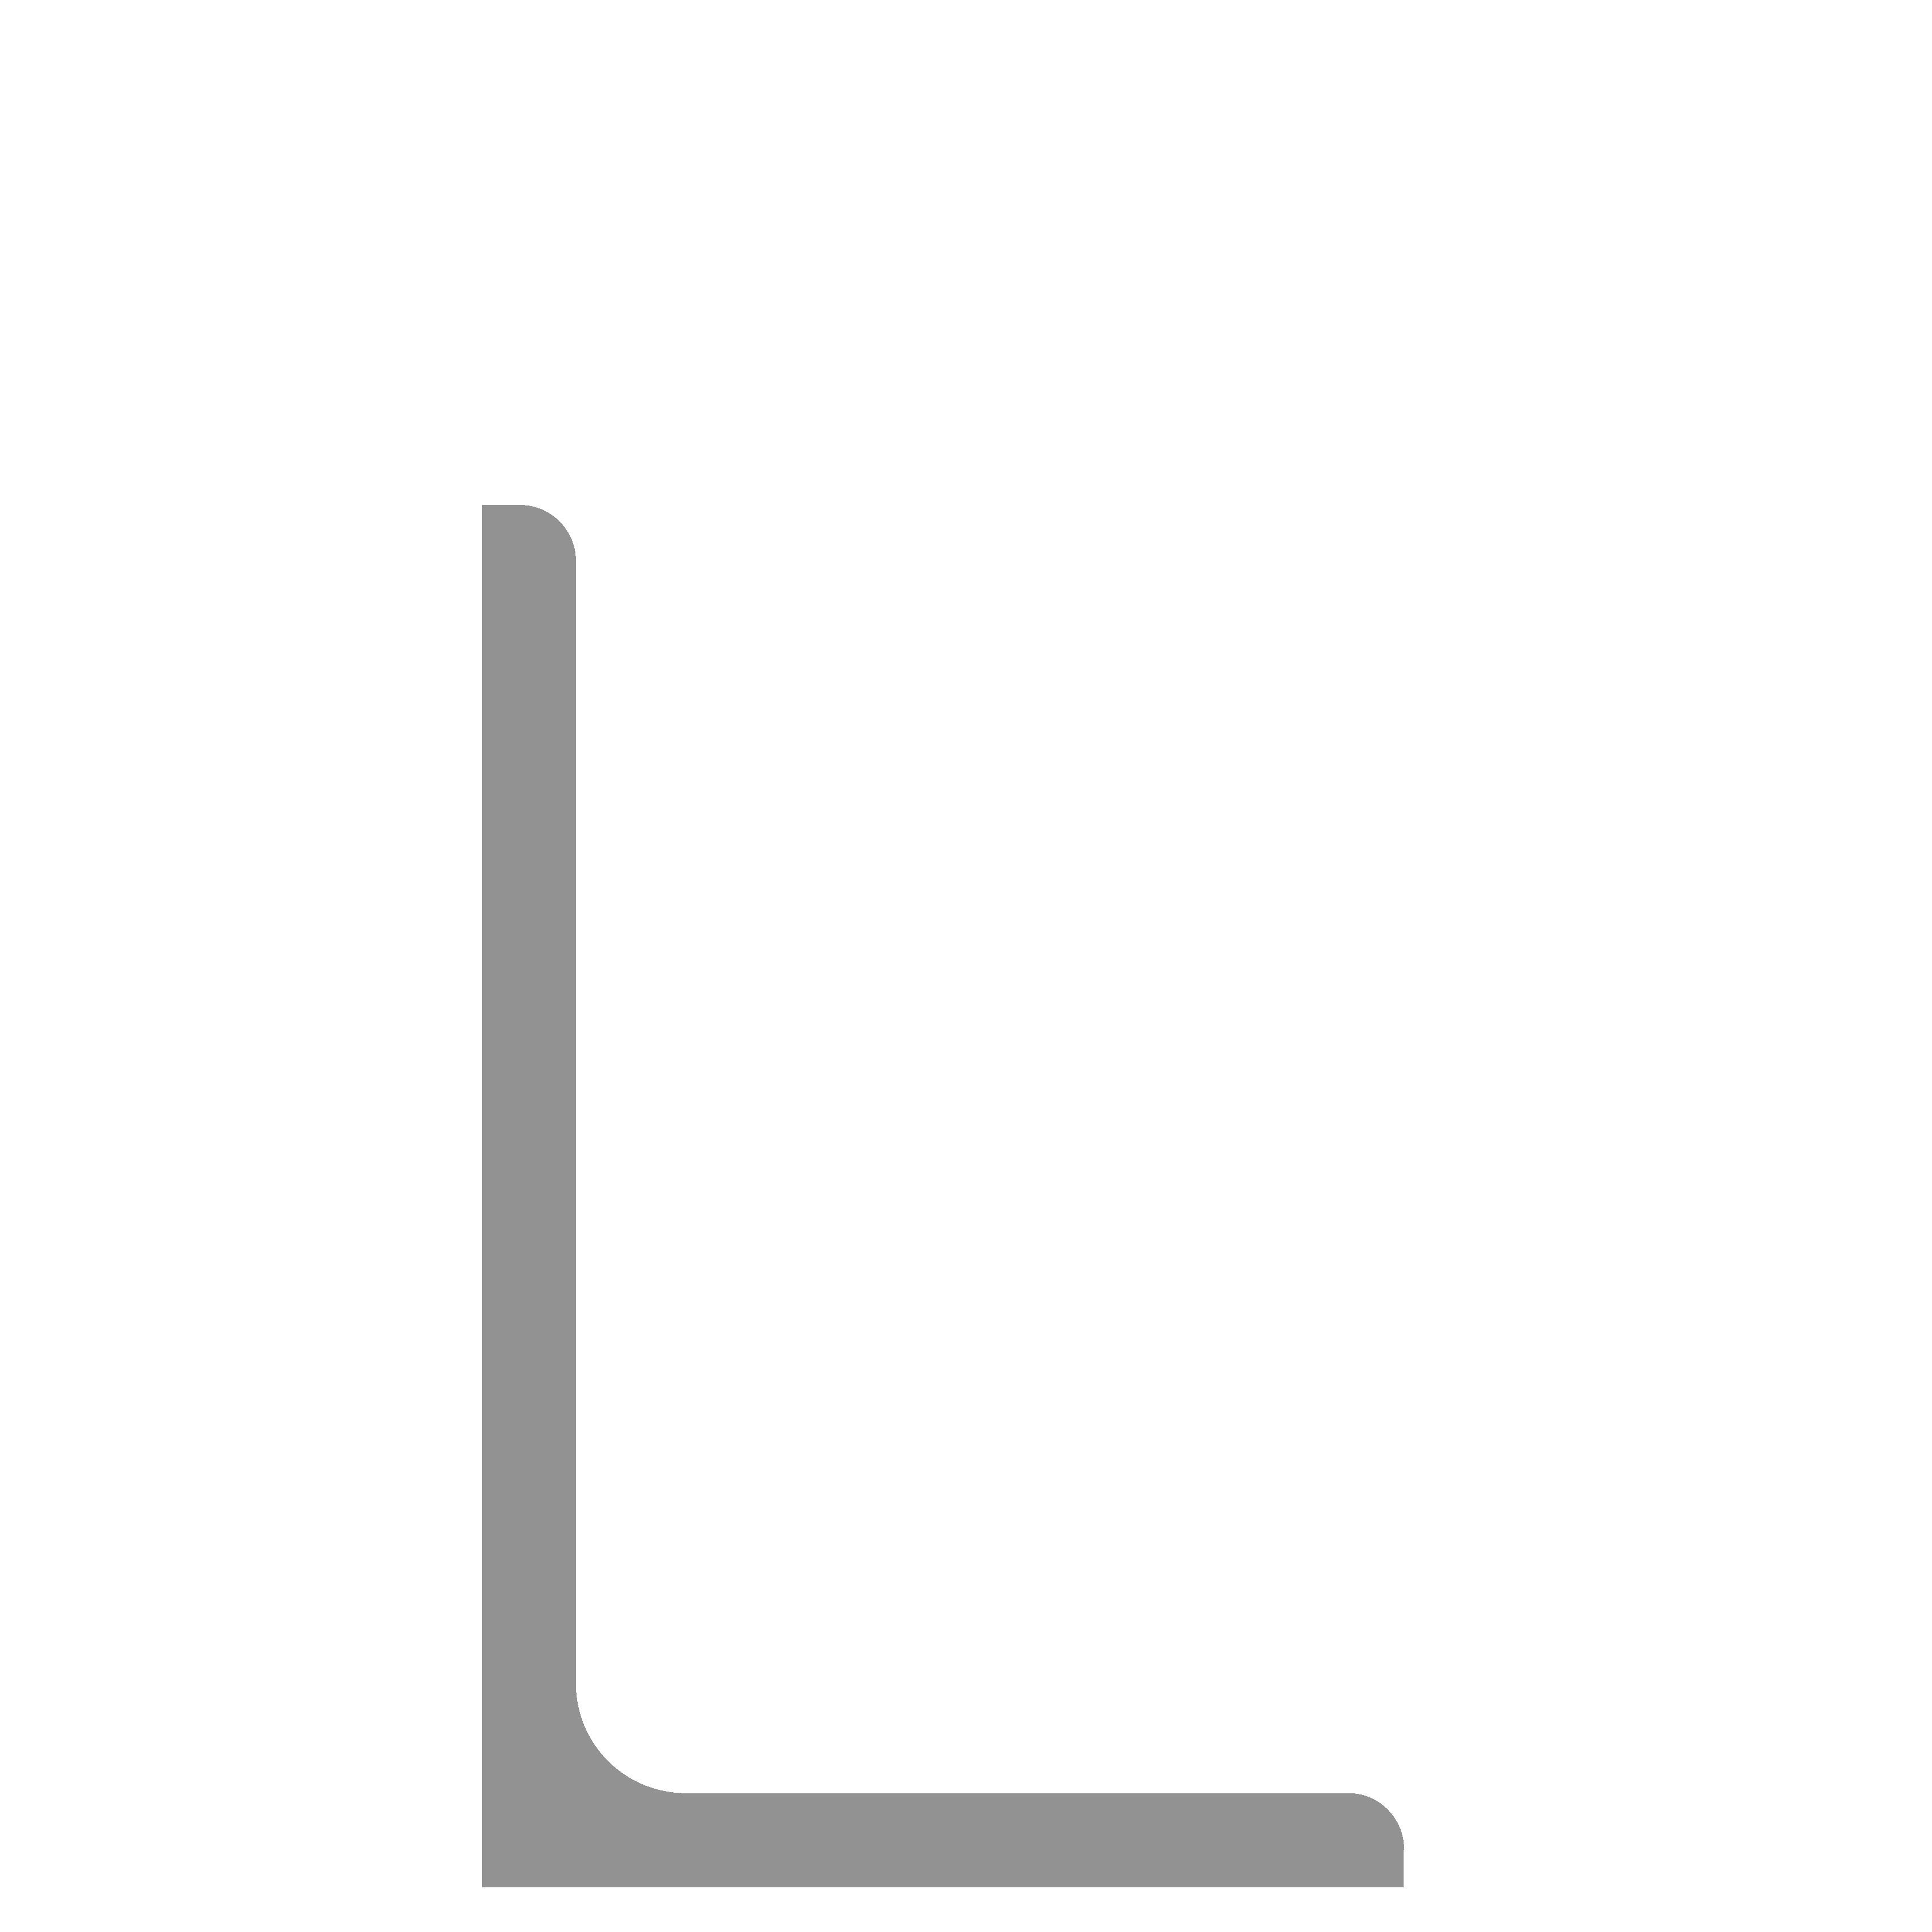 Hoeklijn thermisch verzinkt 150x100x10 mm